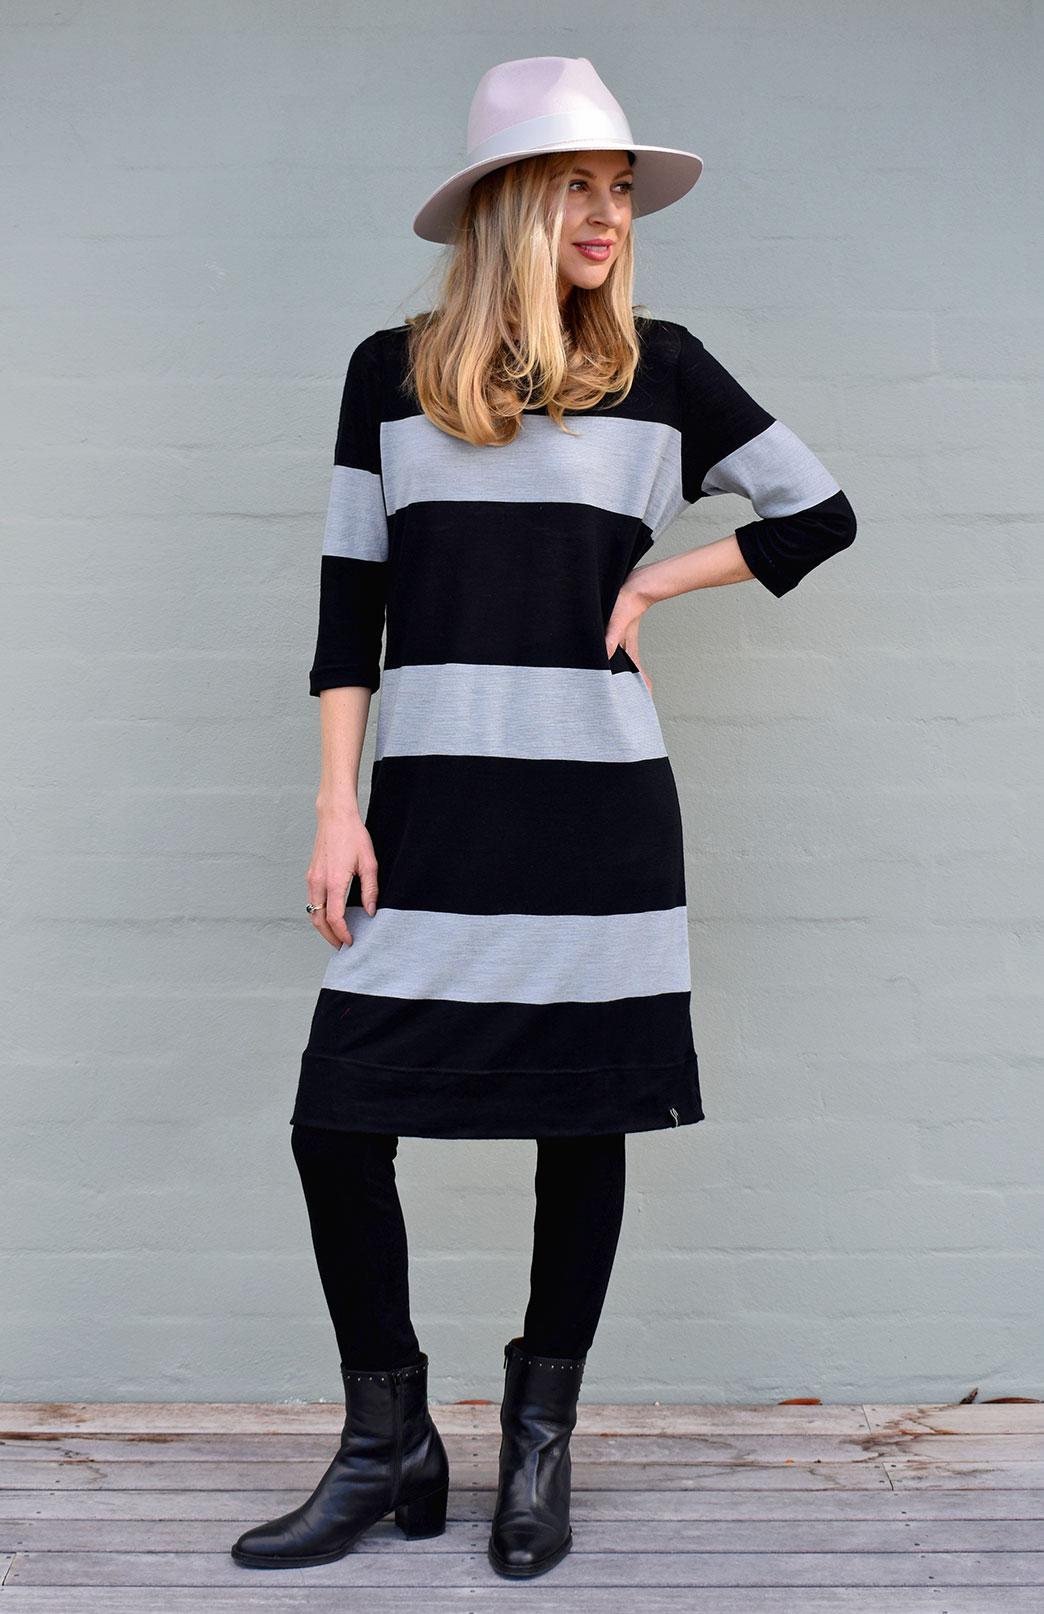 Audrey Shift Dress - Women's Striped 100% Superfine Merino Wool Classic Knee Length Dress - Smitten Merino Tasmania Australia